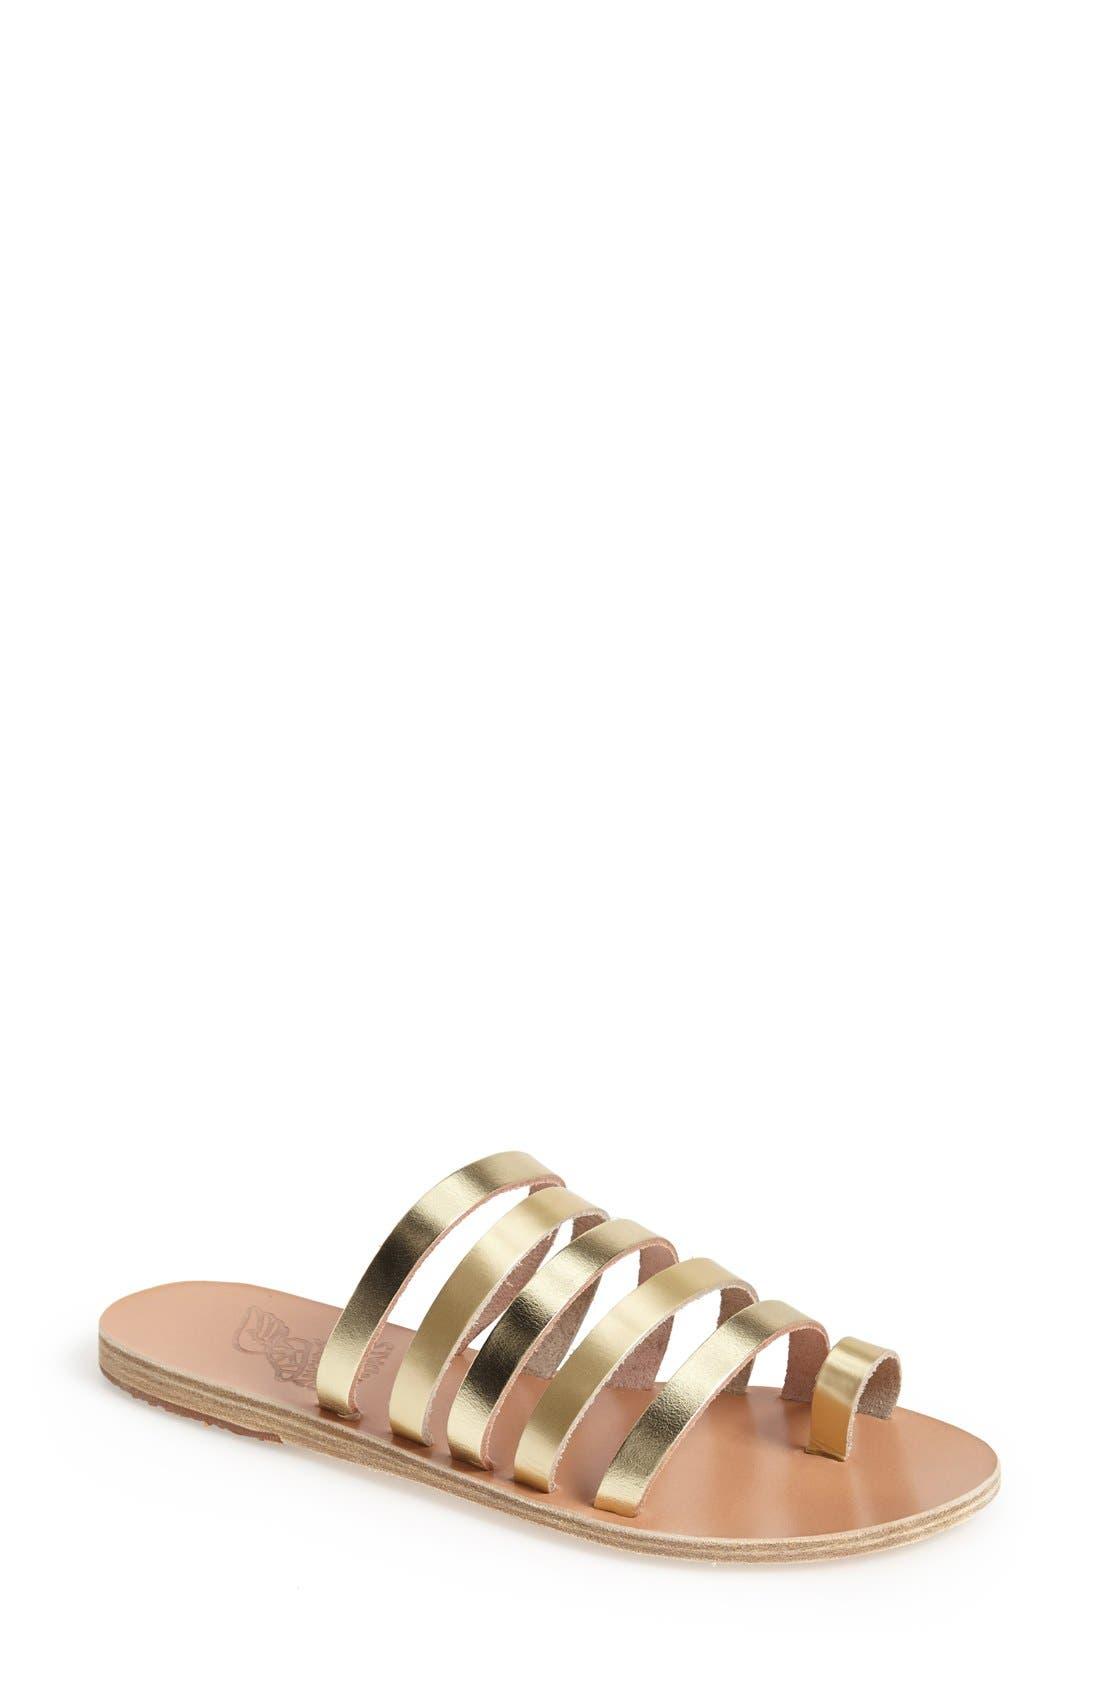 Alternate Image 1 Selected - Ancient Greek Sandals 'Niki' Leather Sandal (Women)